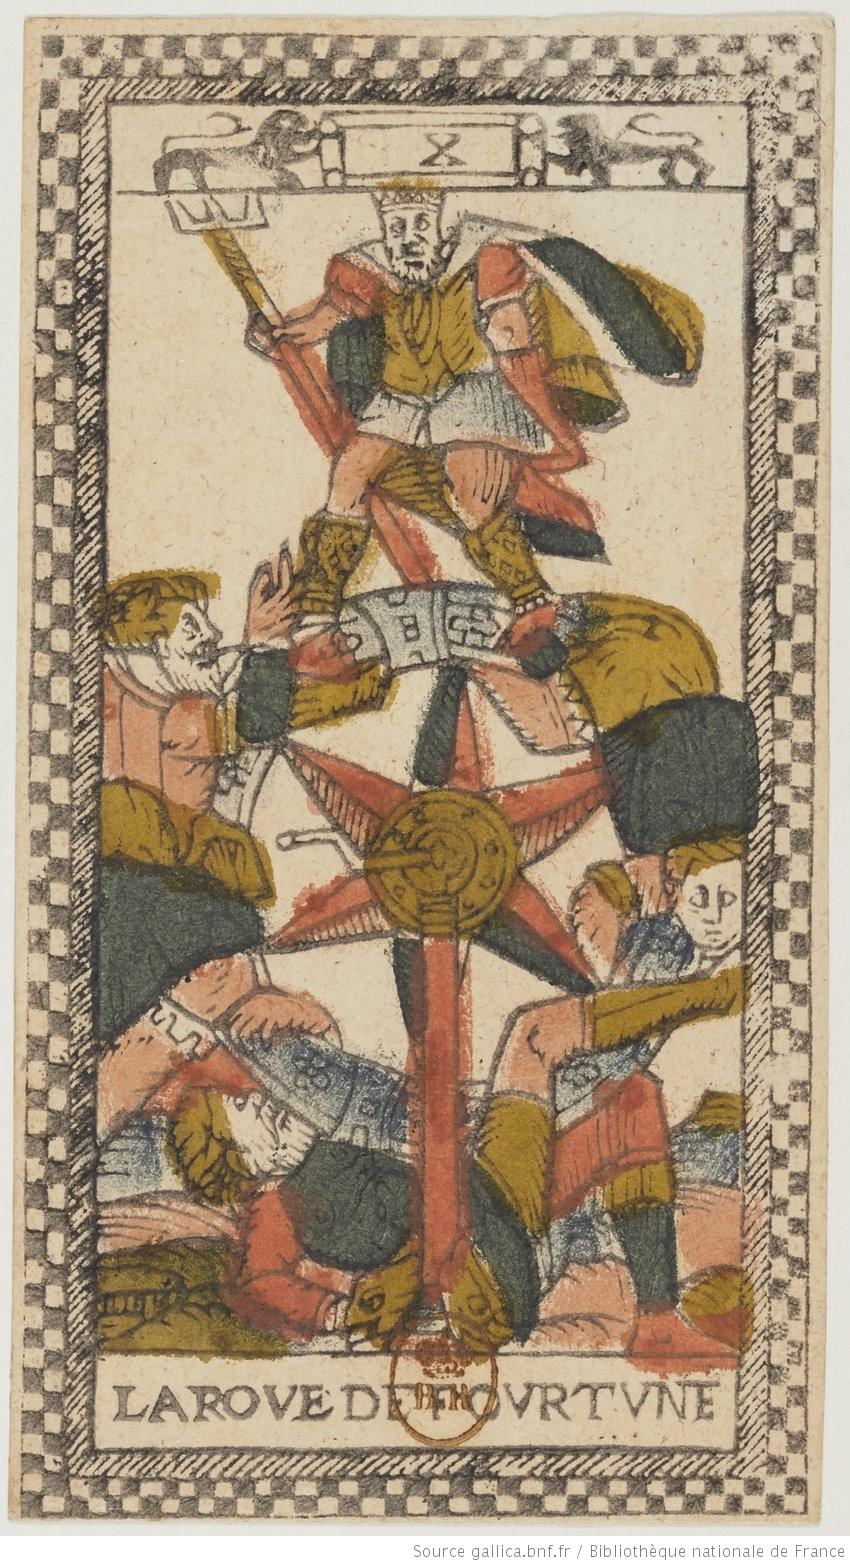 http://gallica.bnf.fr/ark:/12148/btv1b105109624/f19.highres